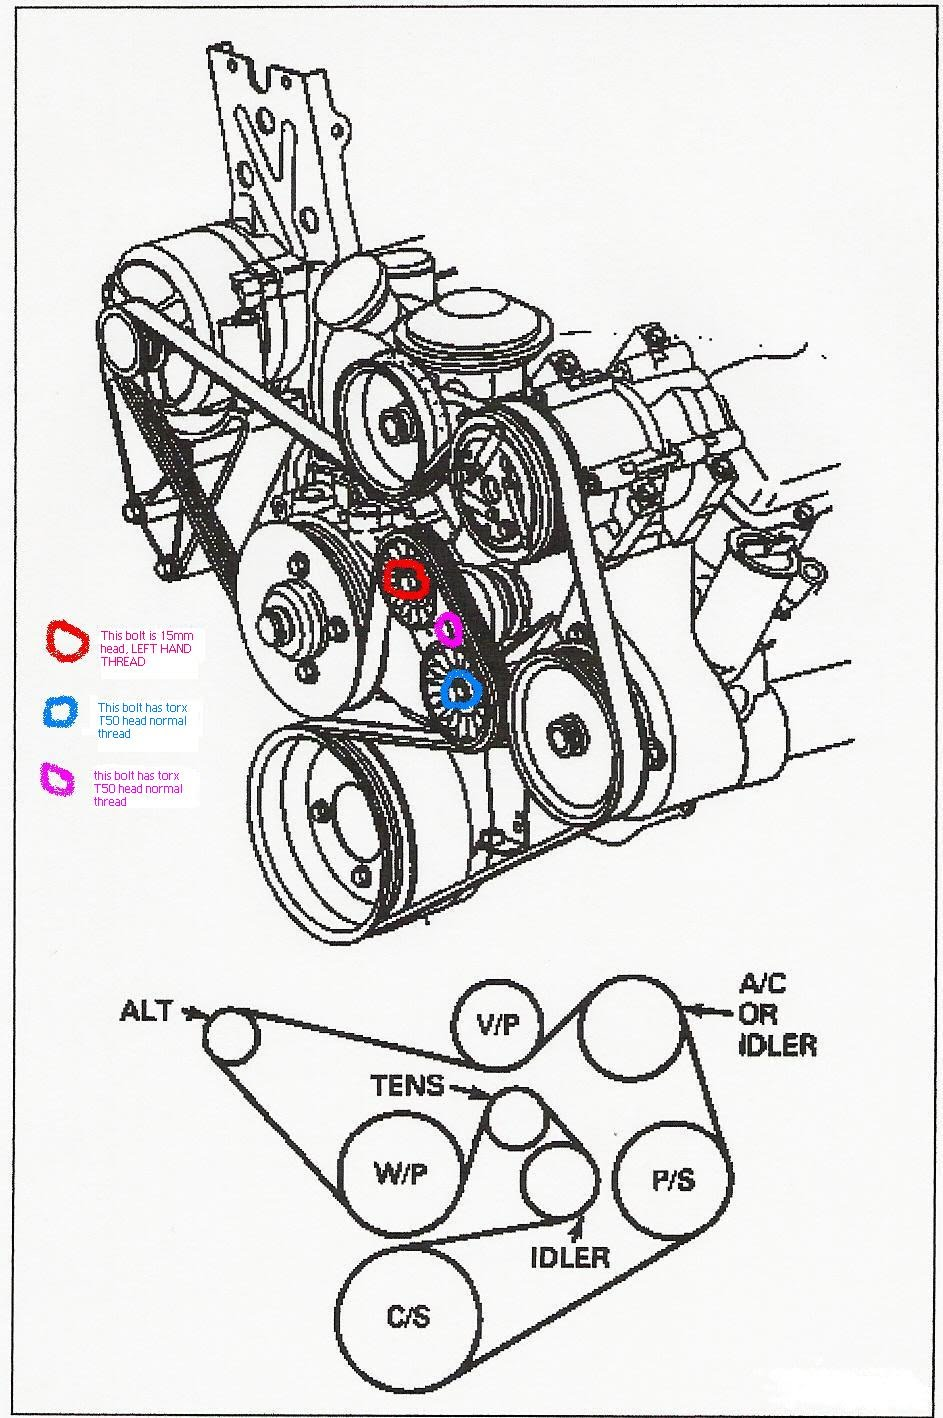 medium resolution of diagrams oldforddiesels 1992 ford f 350 7 3 diesel fuel system pictures 7 3 idi belt diagram